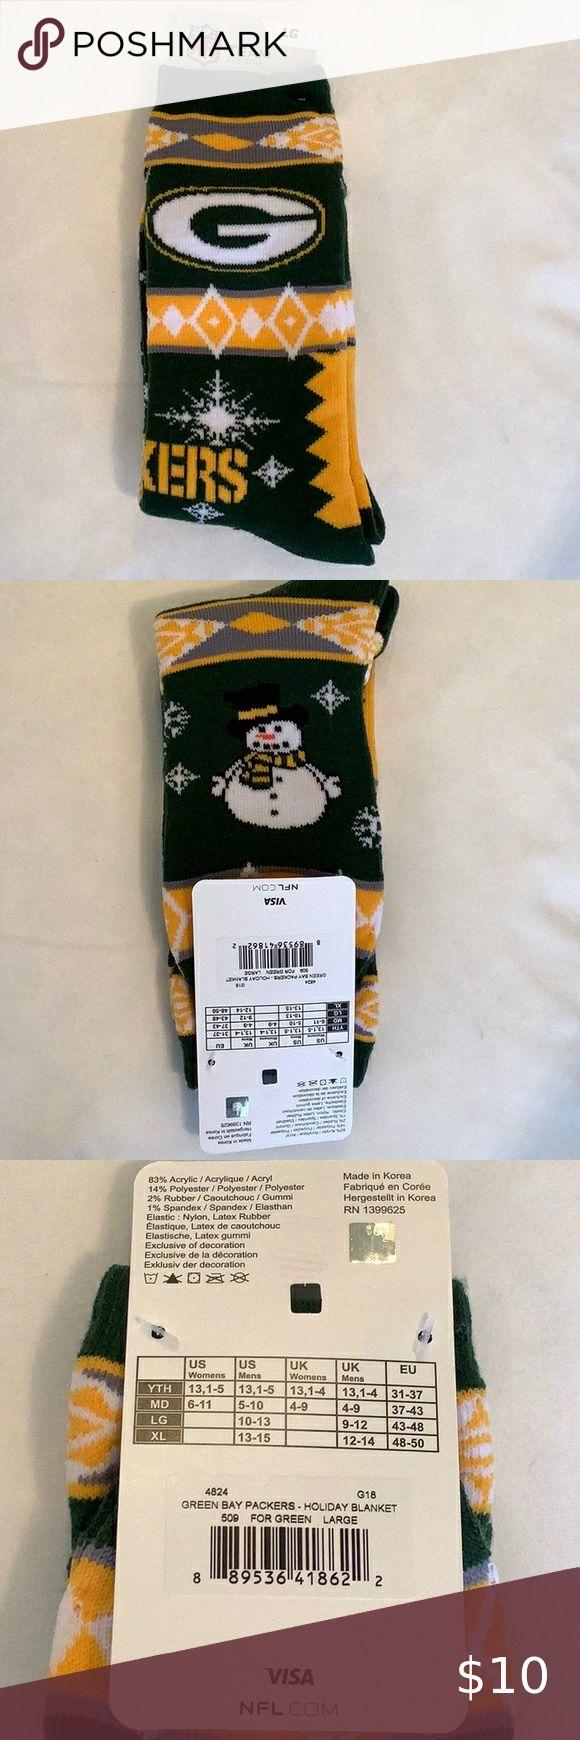 Nfl Green Bay Packer Holiday Socks In 2020 Nfl Green Bay Green Bay Packers Holiday Socks